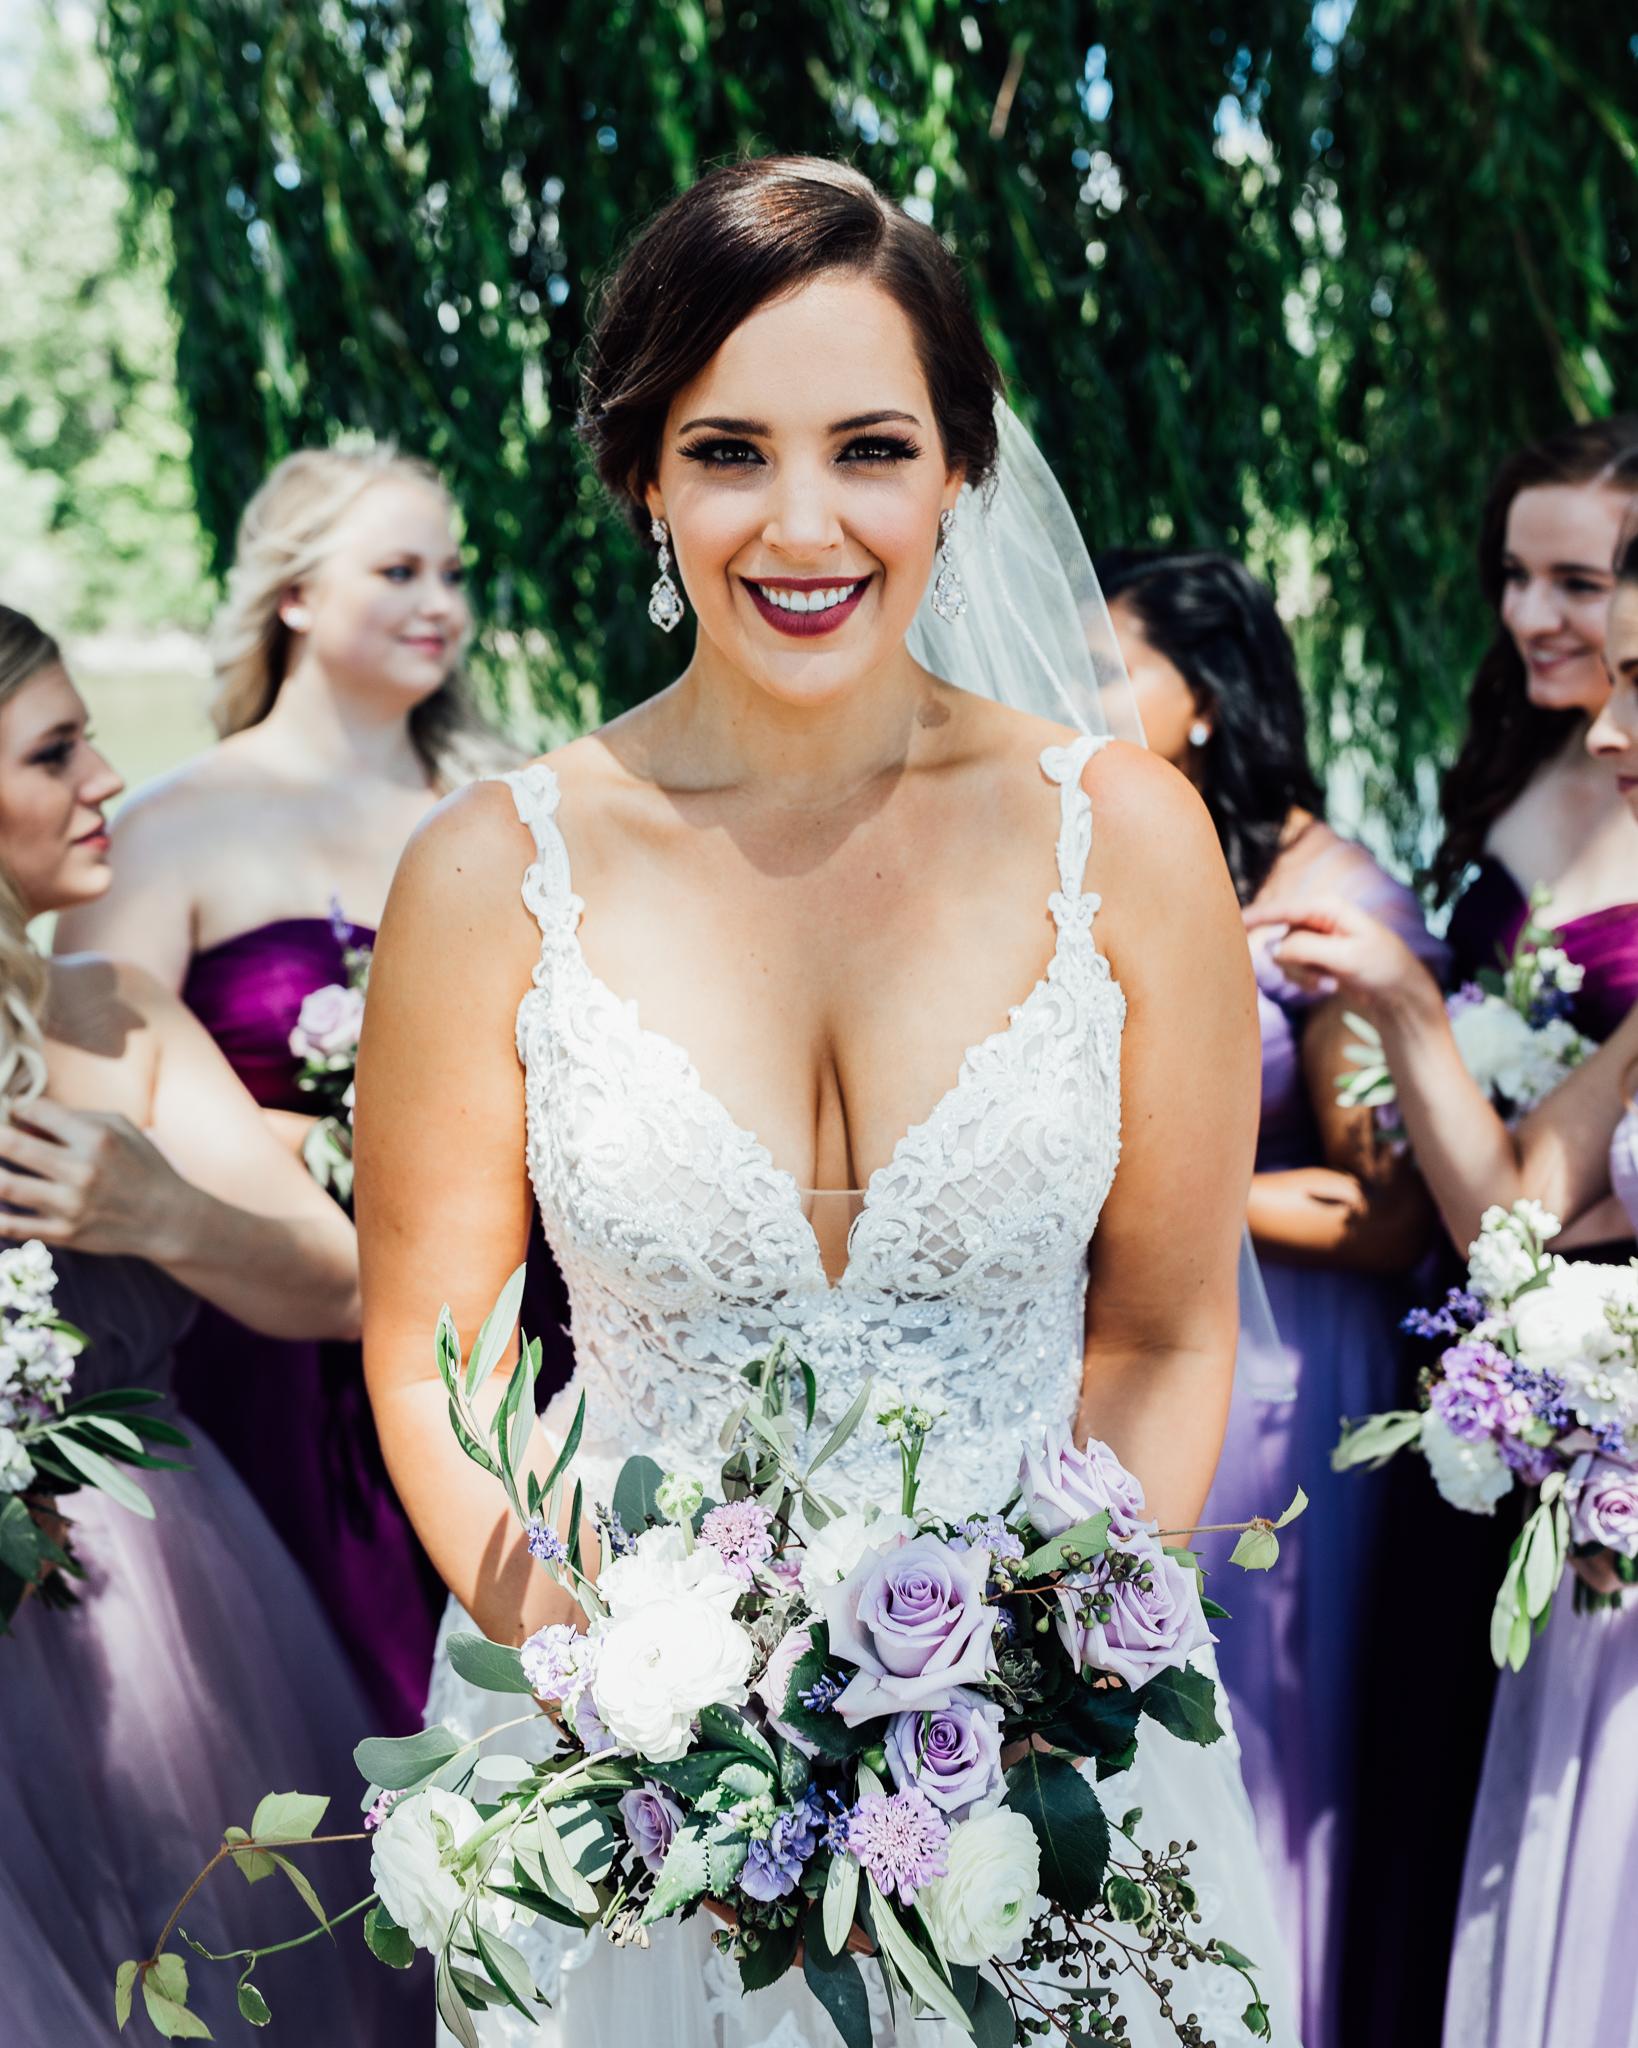 bridalpartyblog-7147.jpg